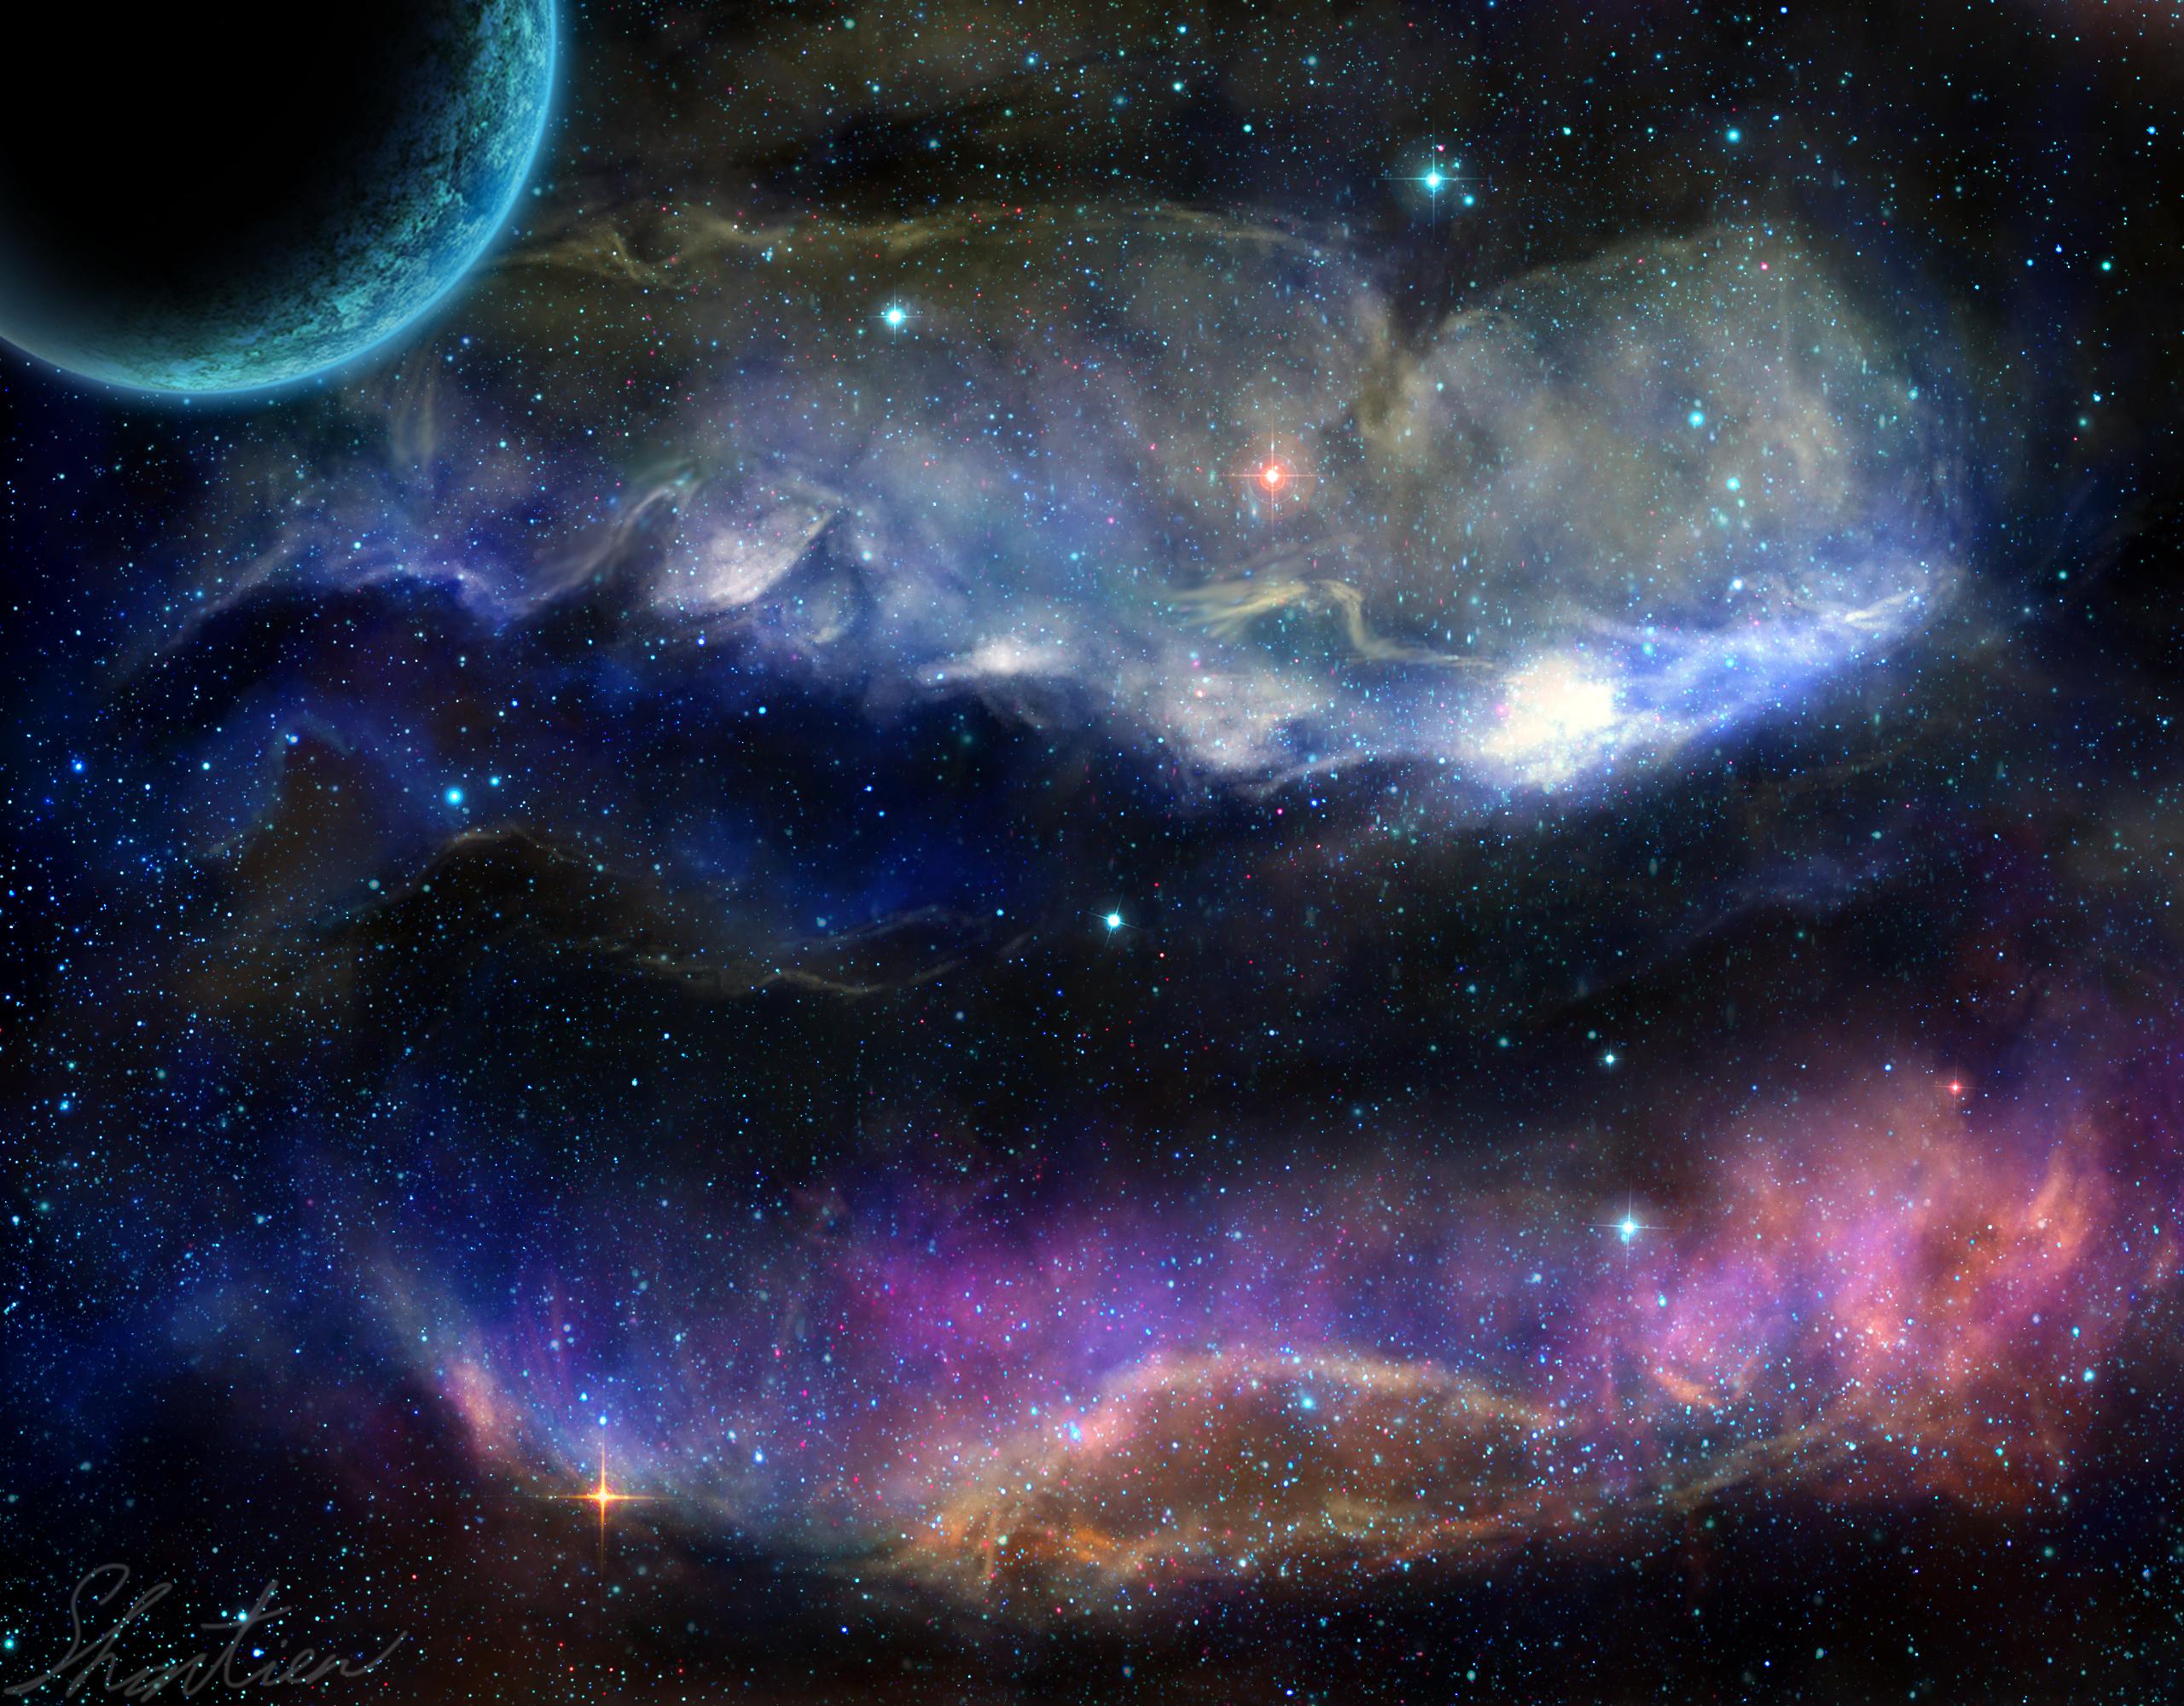 Sci Fi Space 2560x2000